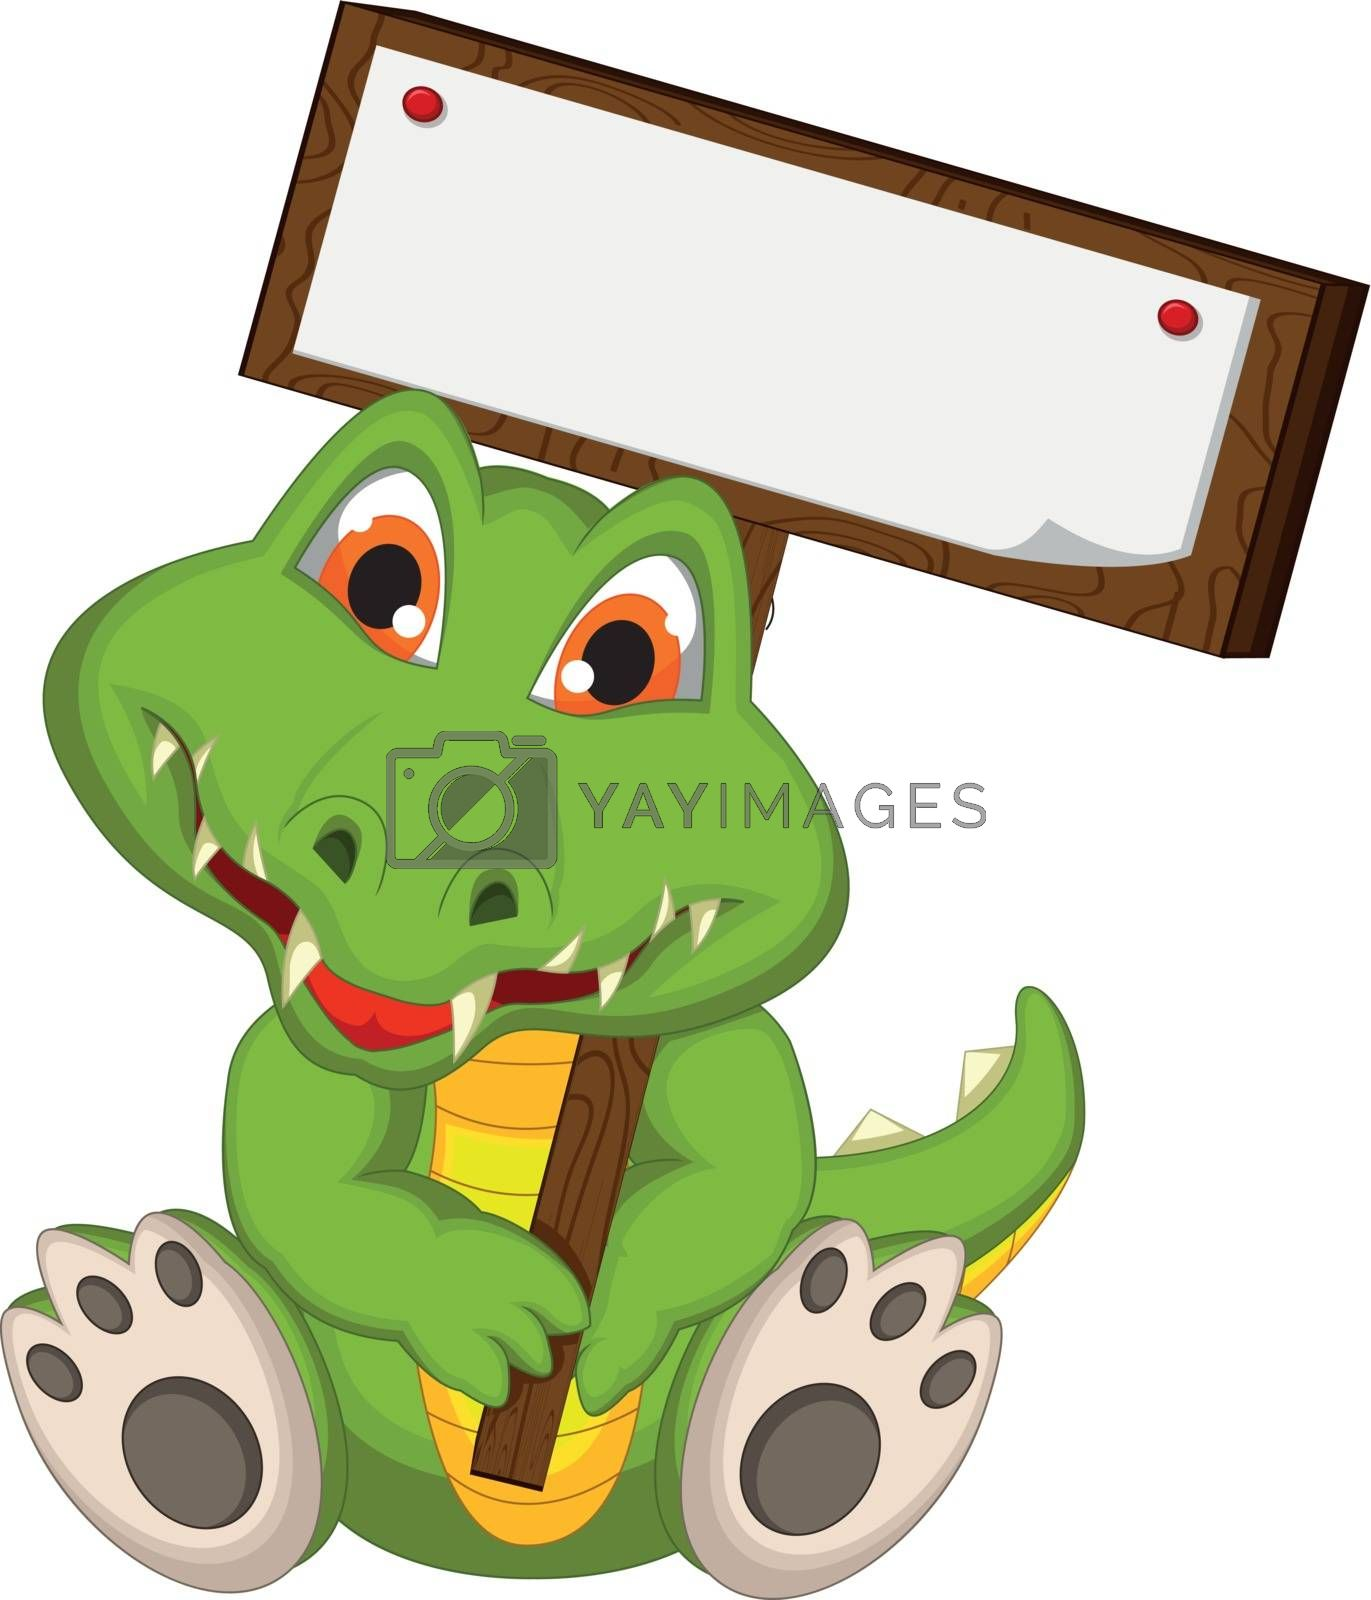 Royalty free image of cute crocodile cartoon holding blank board by sujono